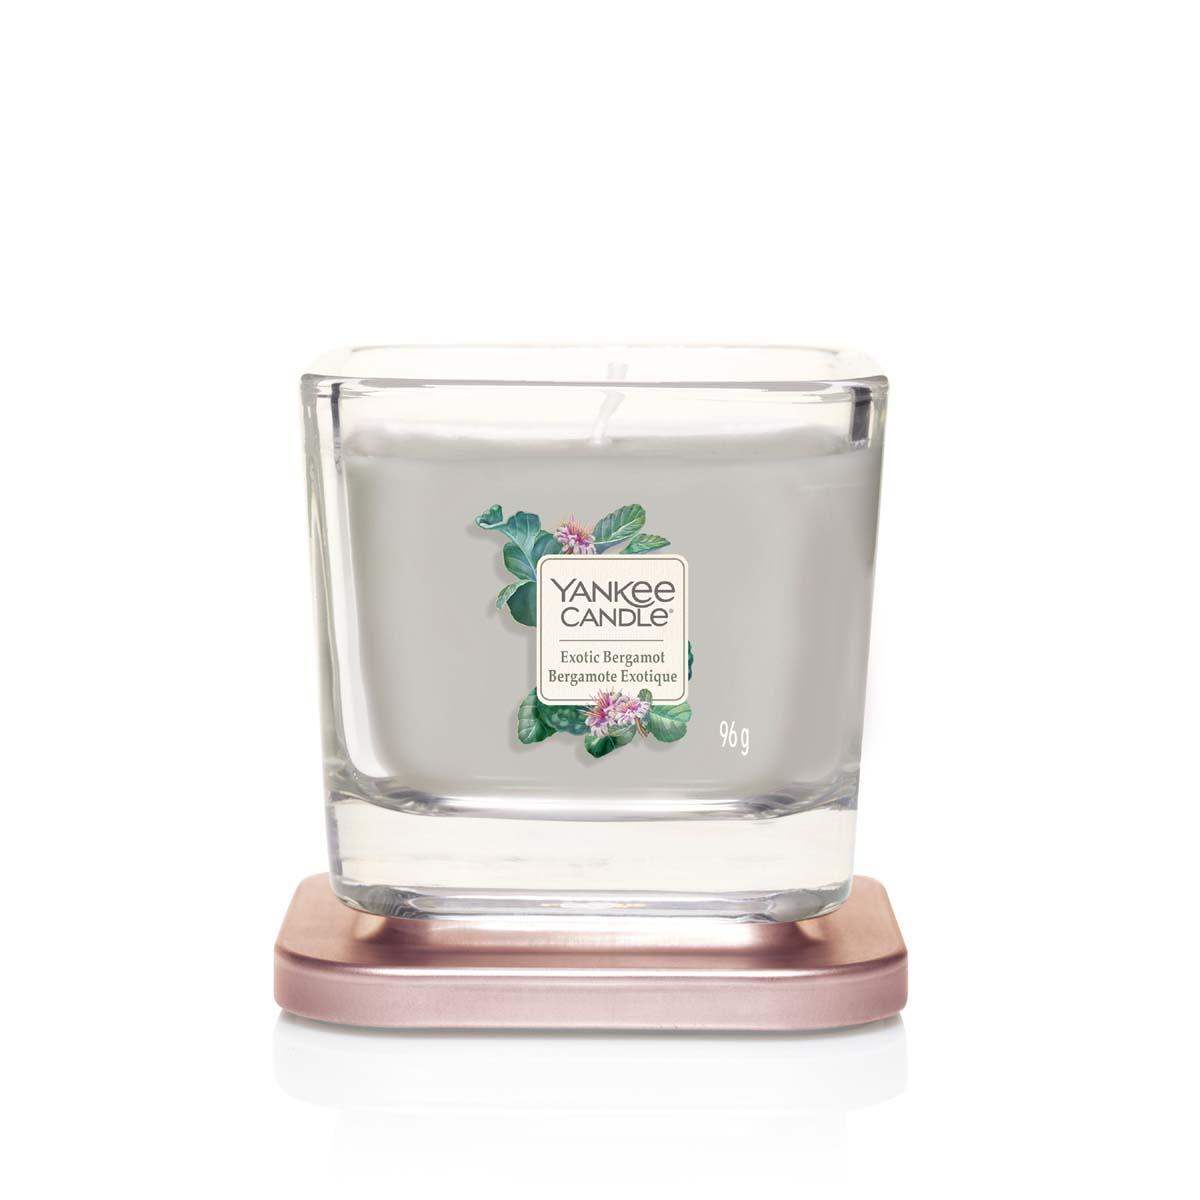 Yankee Candle Exotic Bergamot Square Vessel Piccola